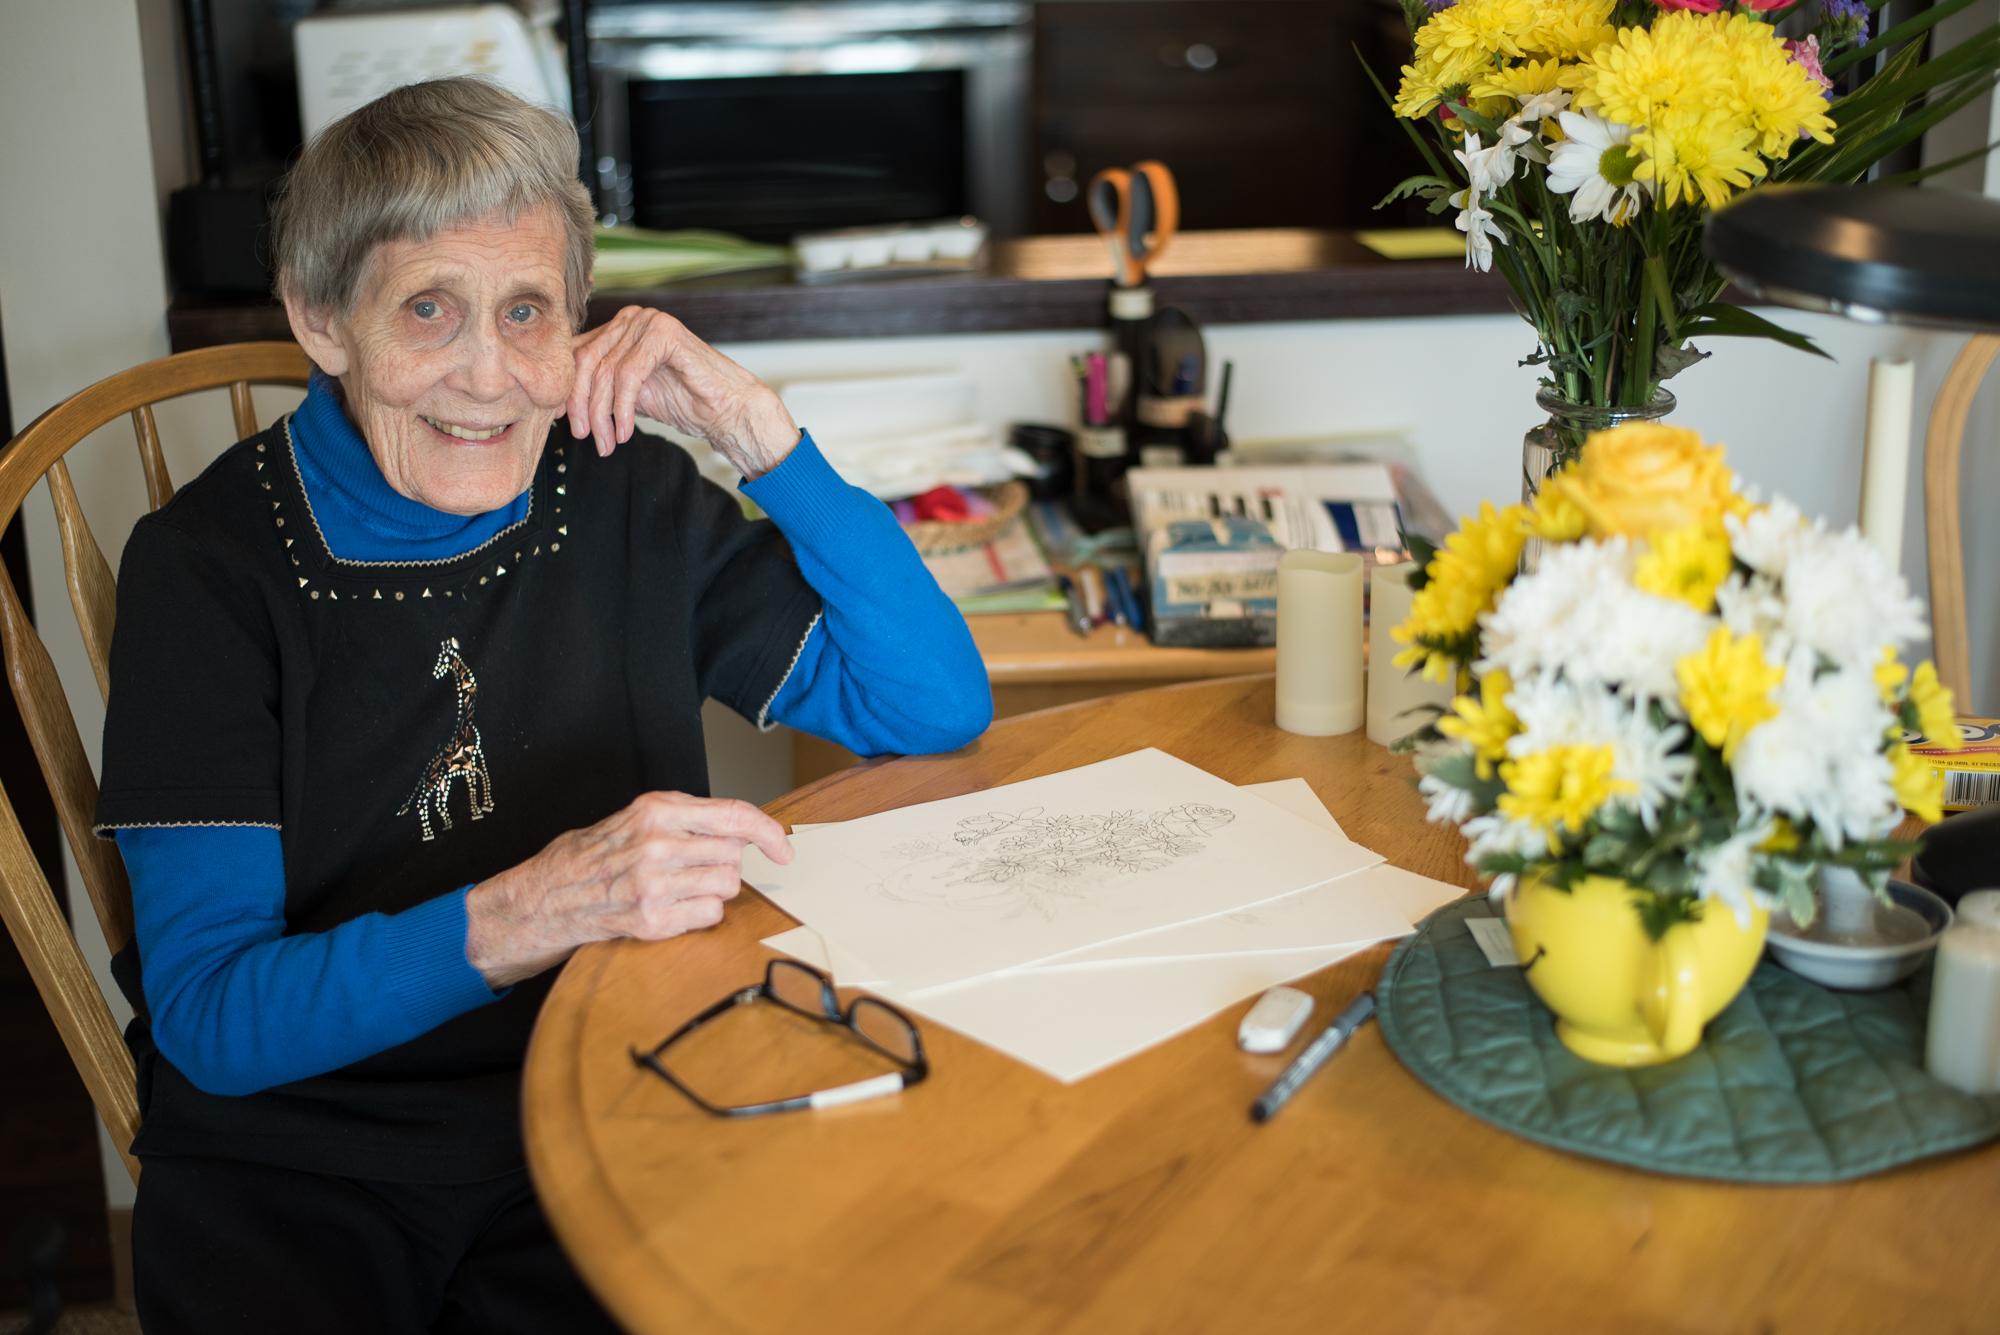 Meet Winnie Conger, 94-year-old artist